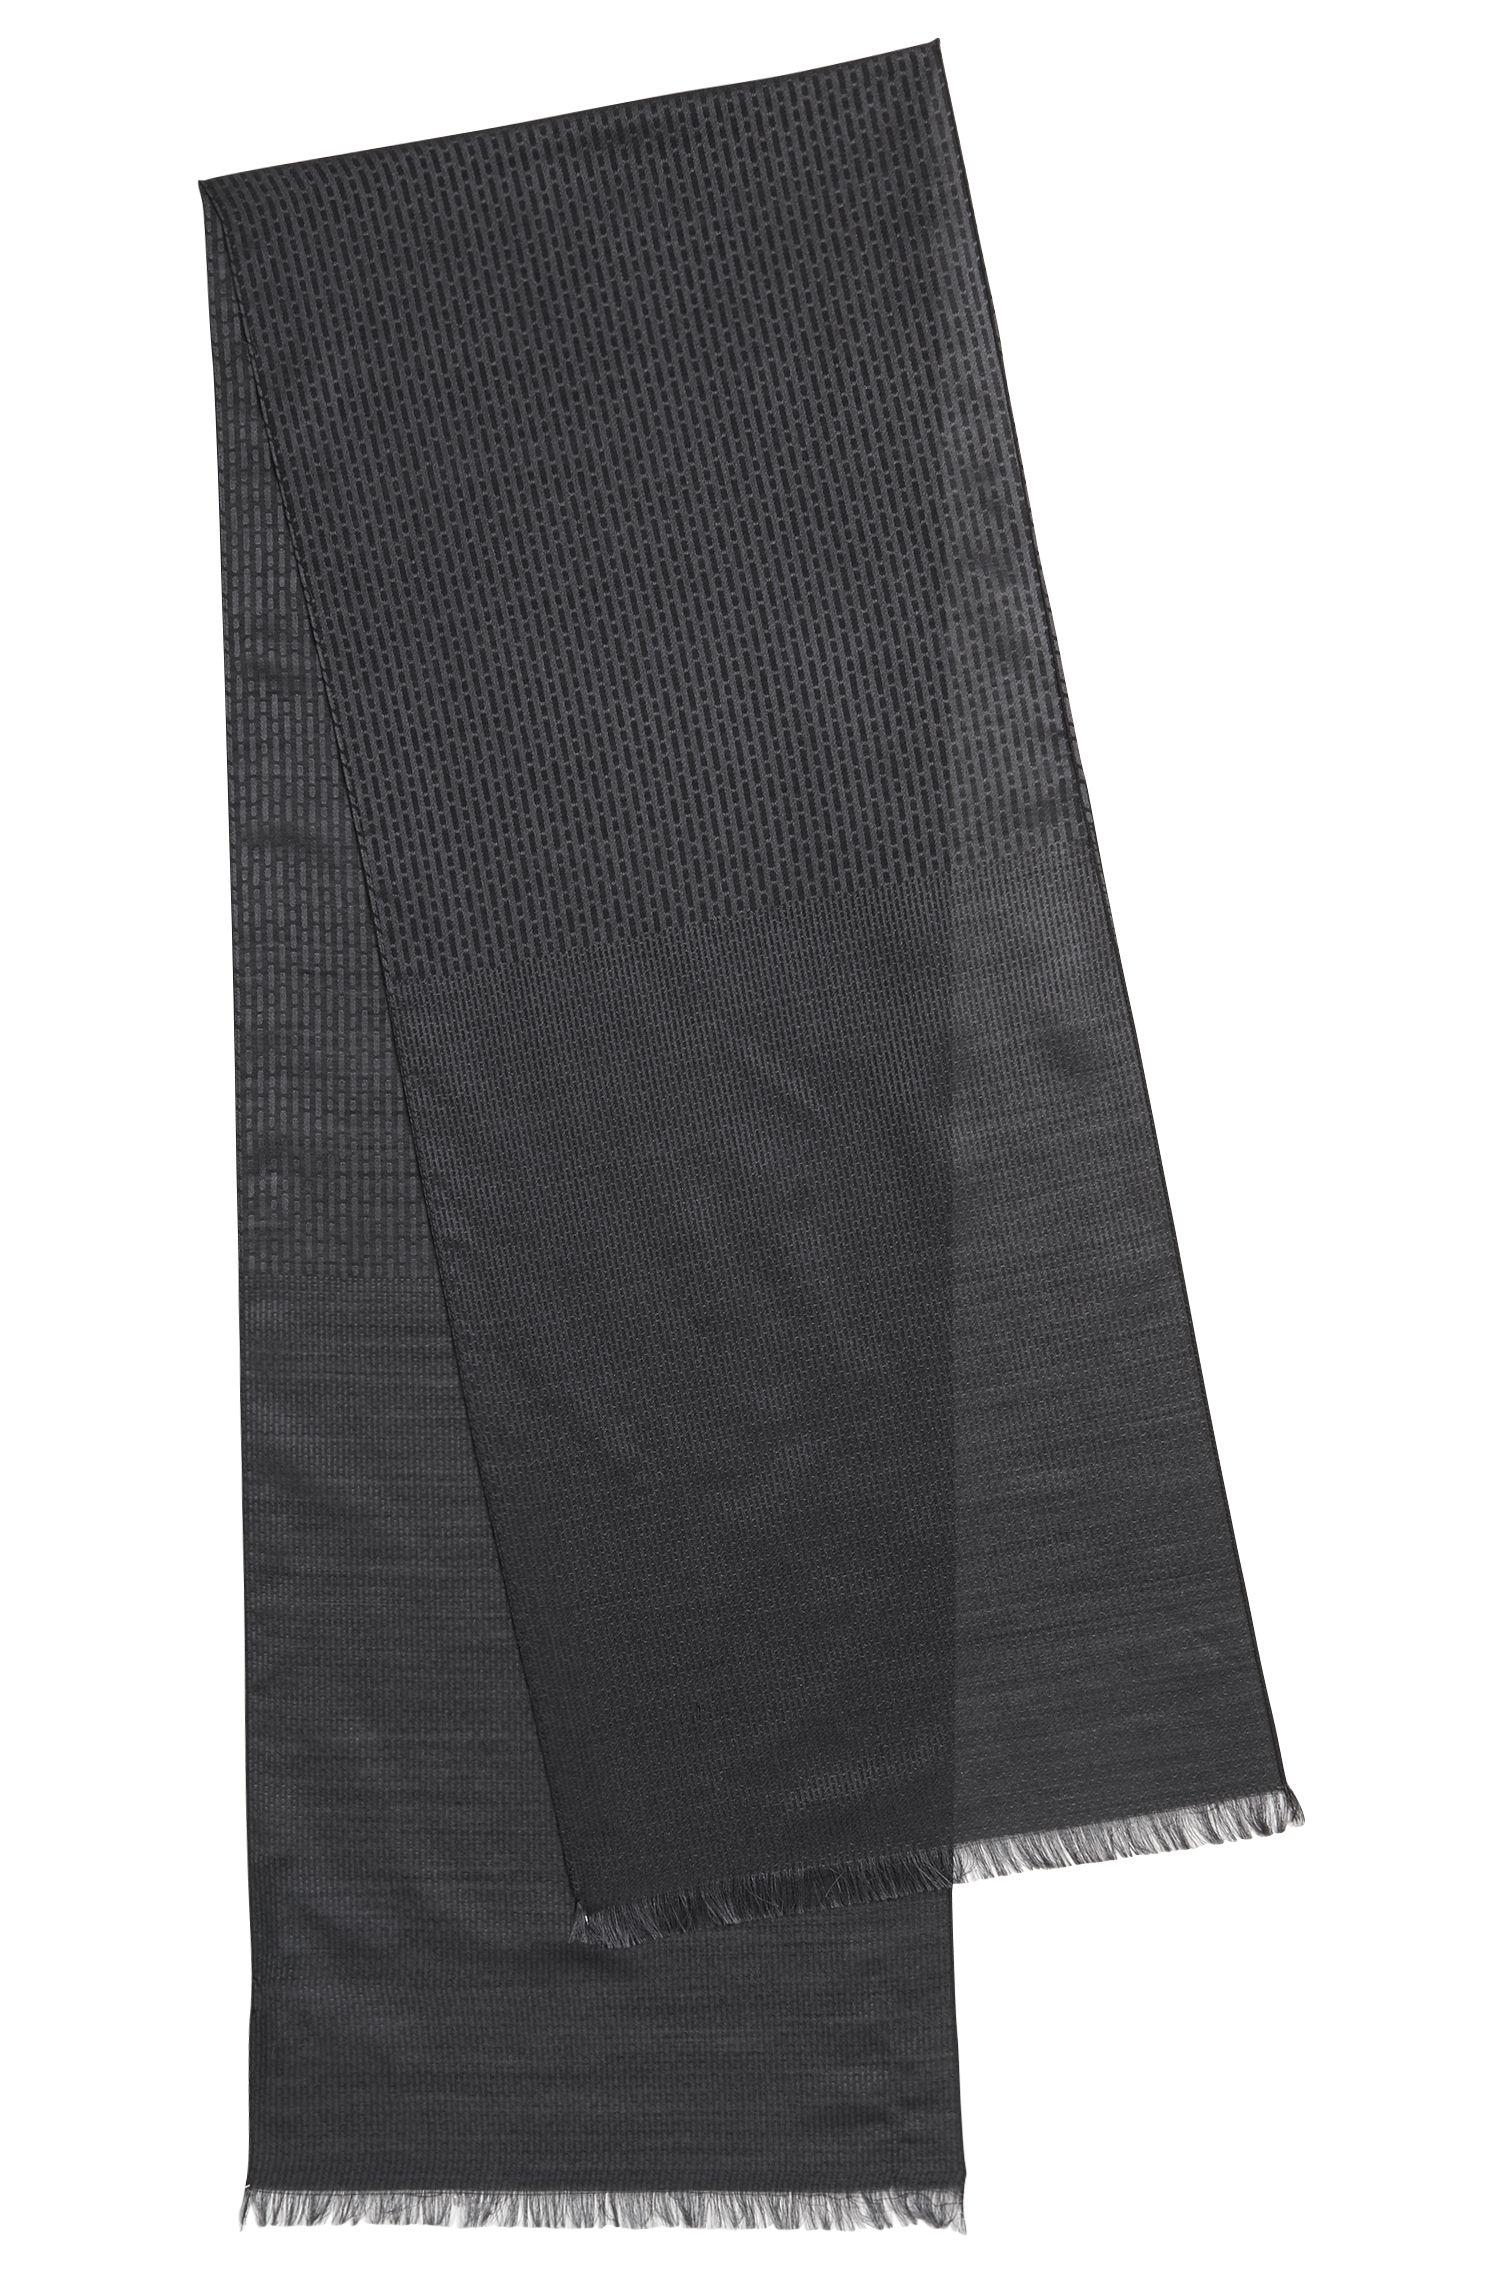 Mercedes-Benz Collection scarf in a lightweight virgin-wool blend jacquard